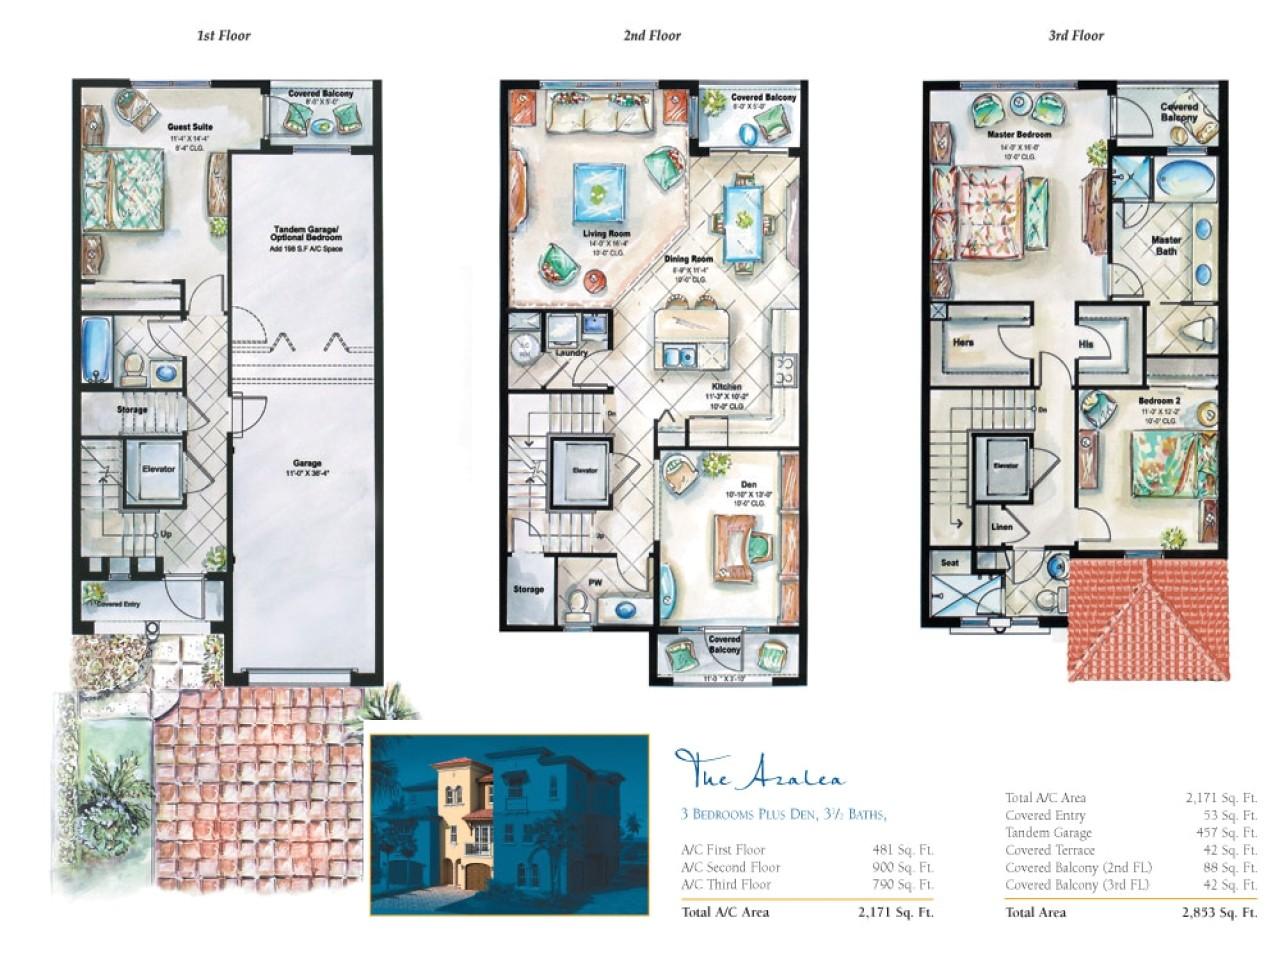 b96ec293ff2a7b75 3 story townhouse floor plans target barbie dream townhouse